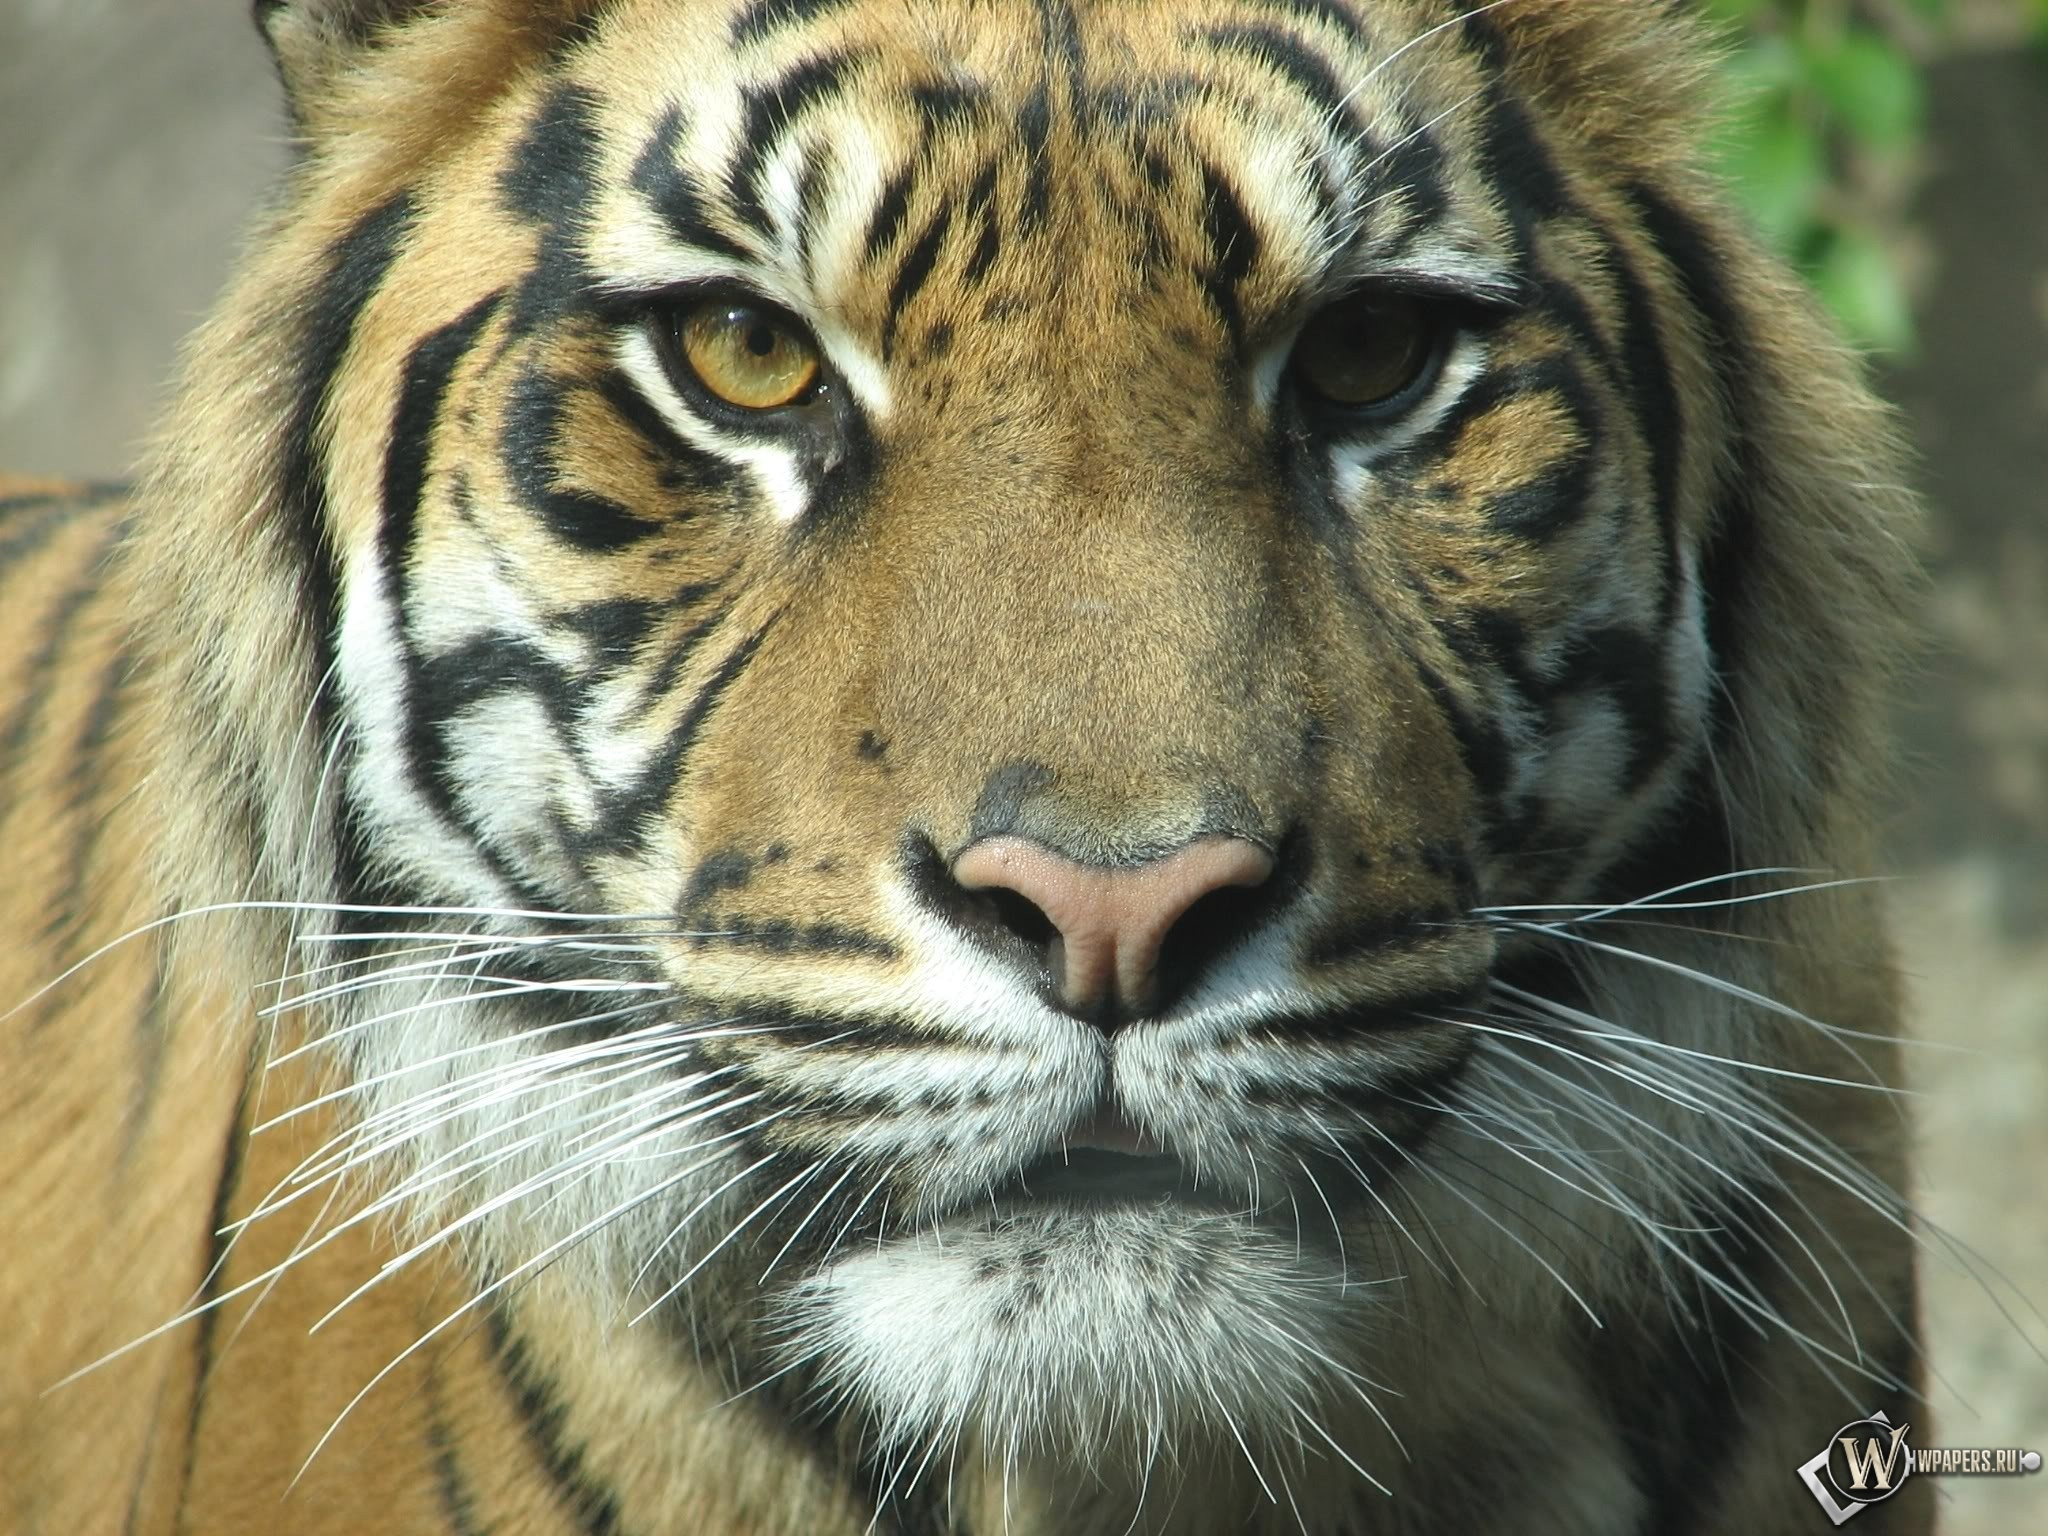 Взгляд тигра 2048x1536